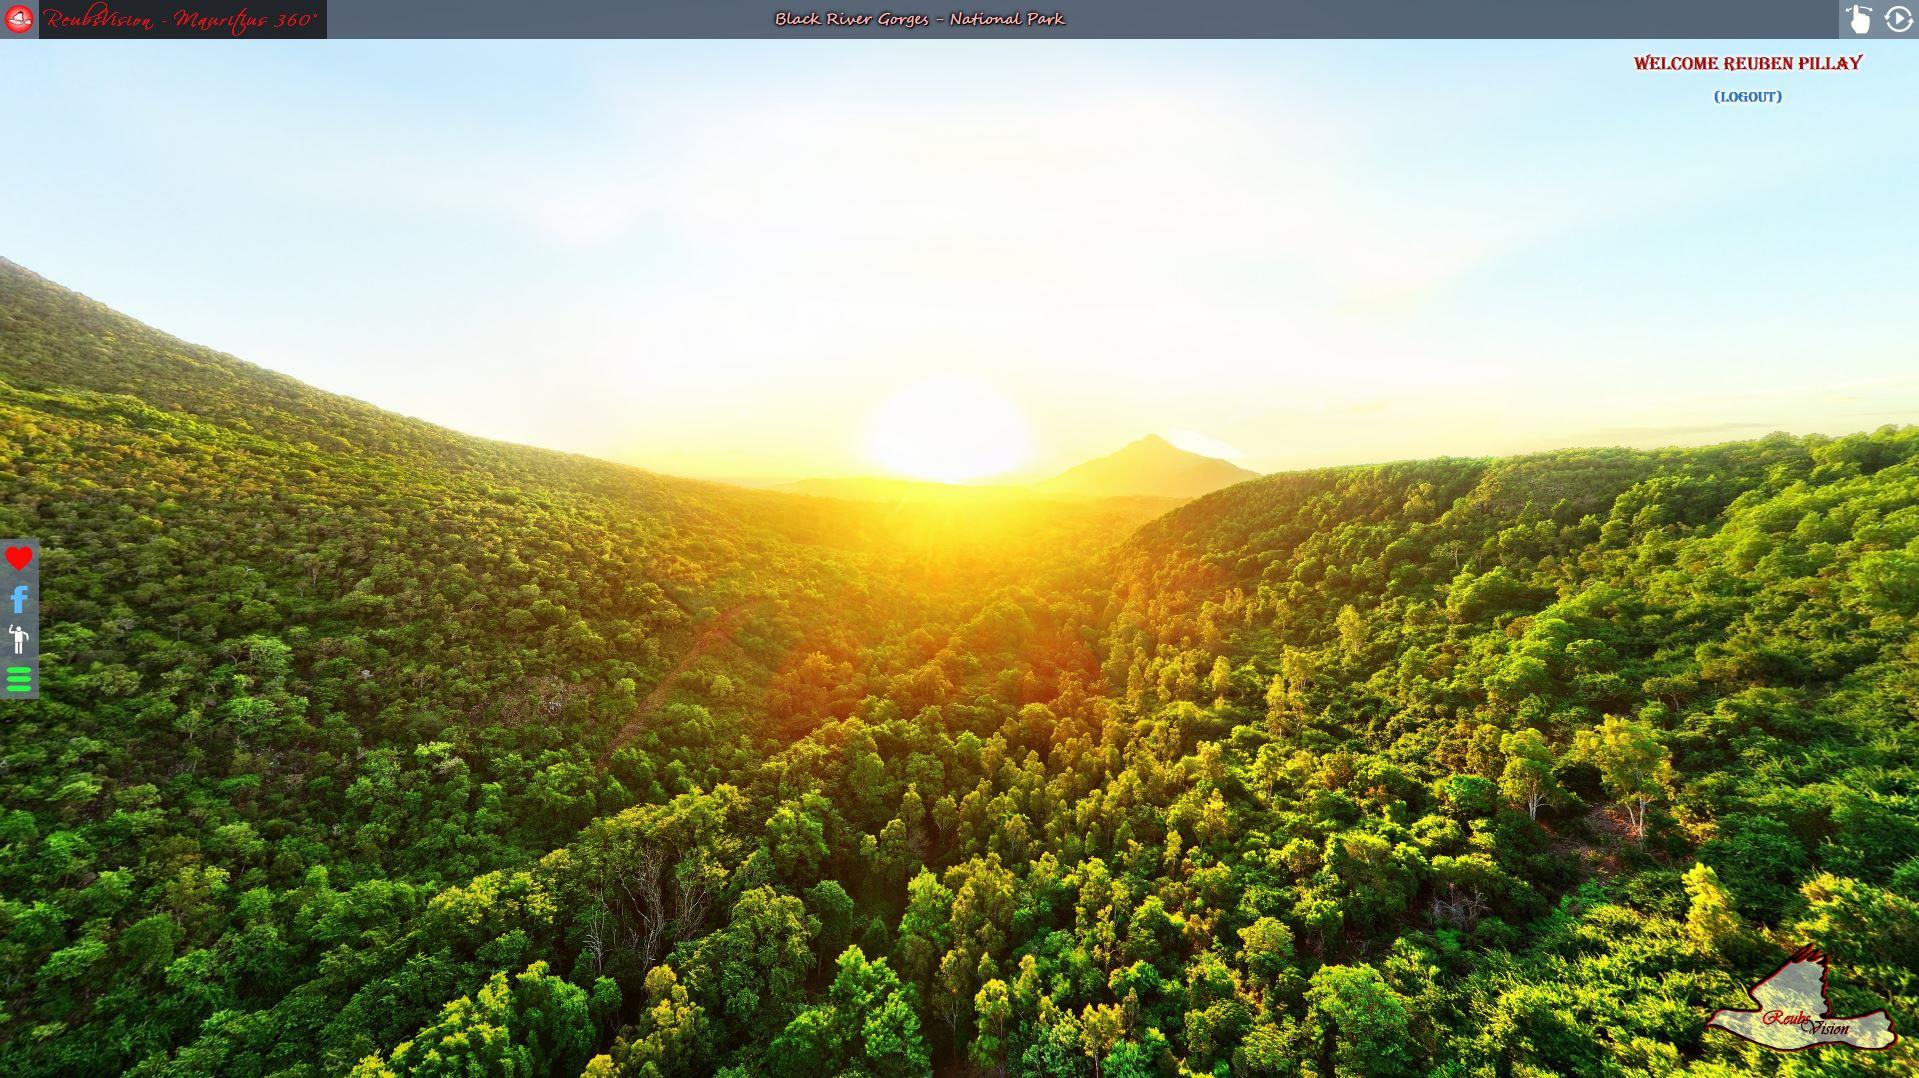 2020-06-26 01_39_57-ReubsVision – Mauritius 360 – Firefox Developer Edition